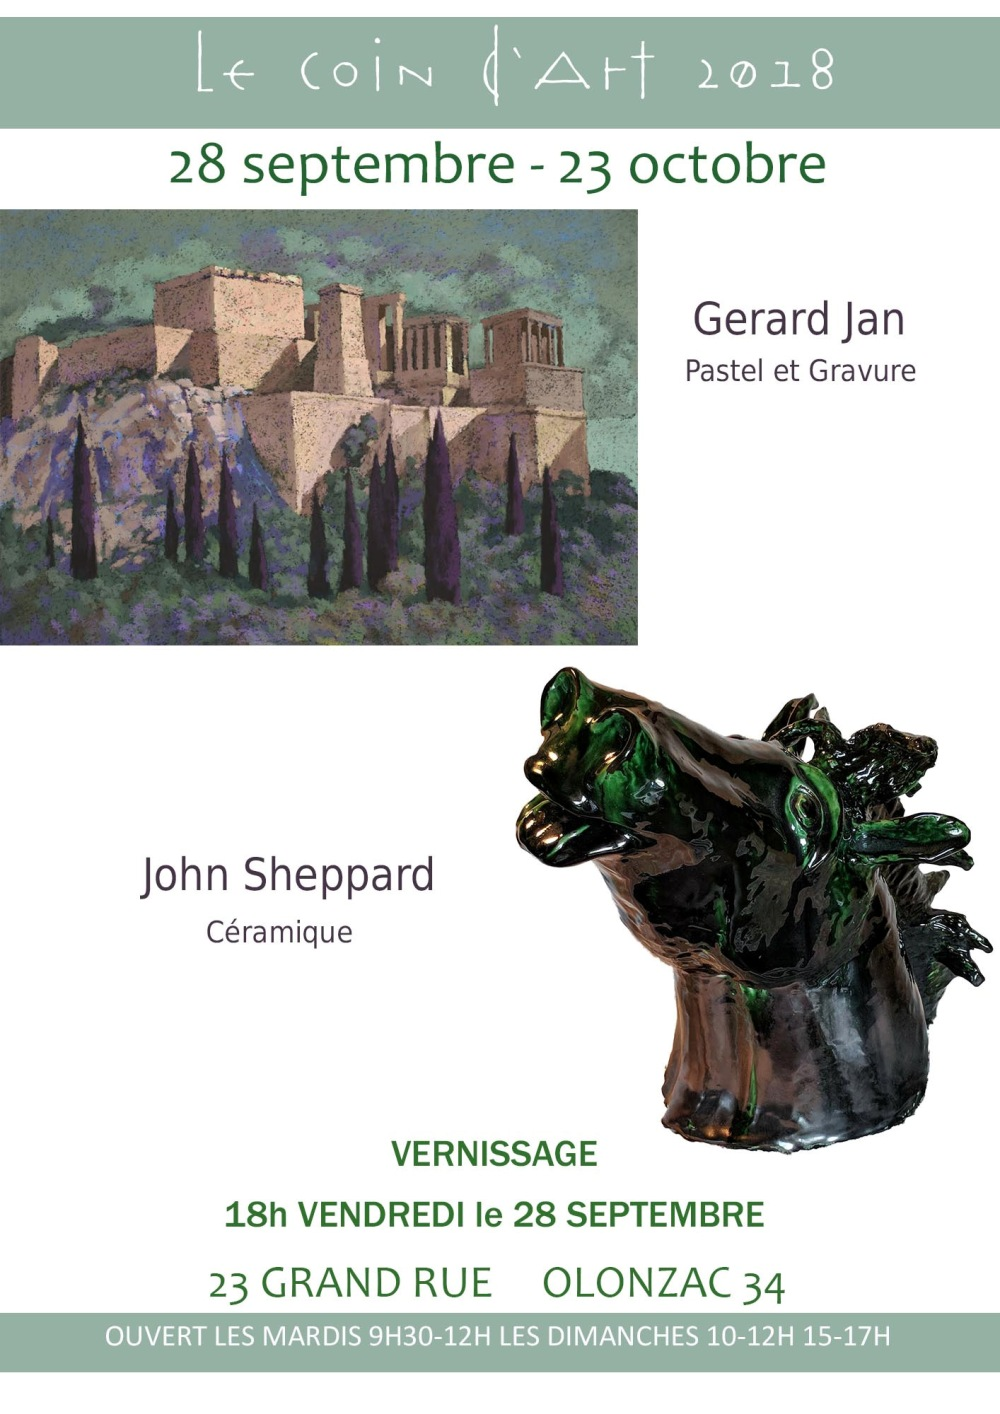 gerard jan-john sheppard poster